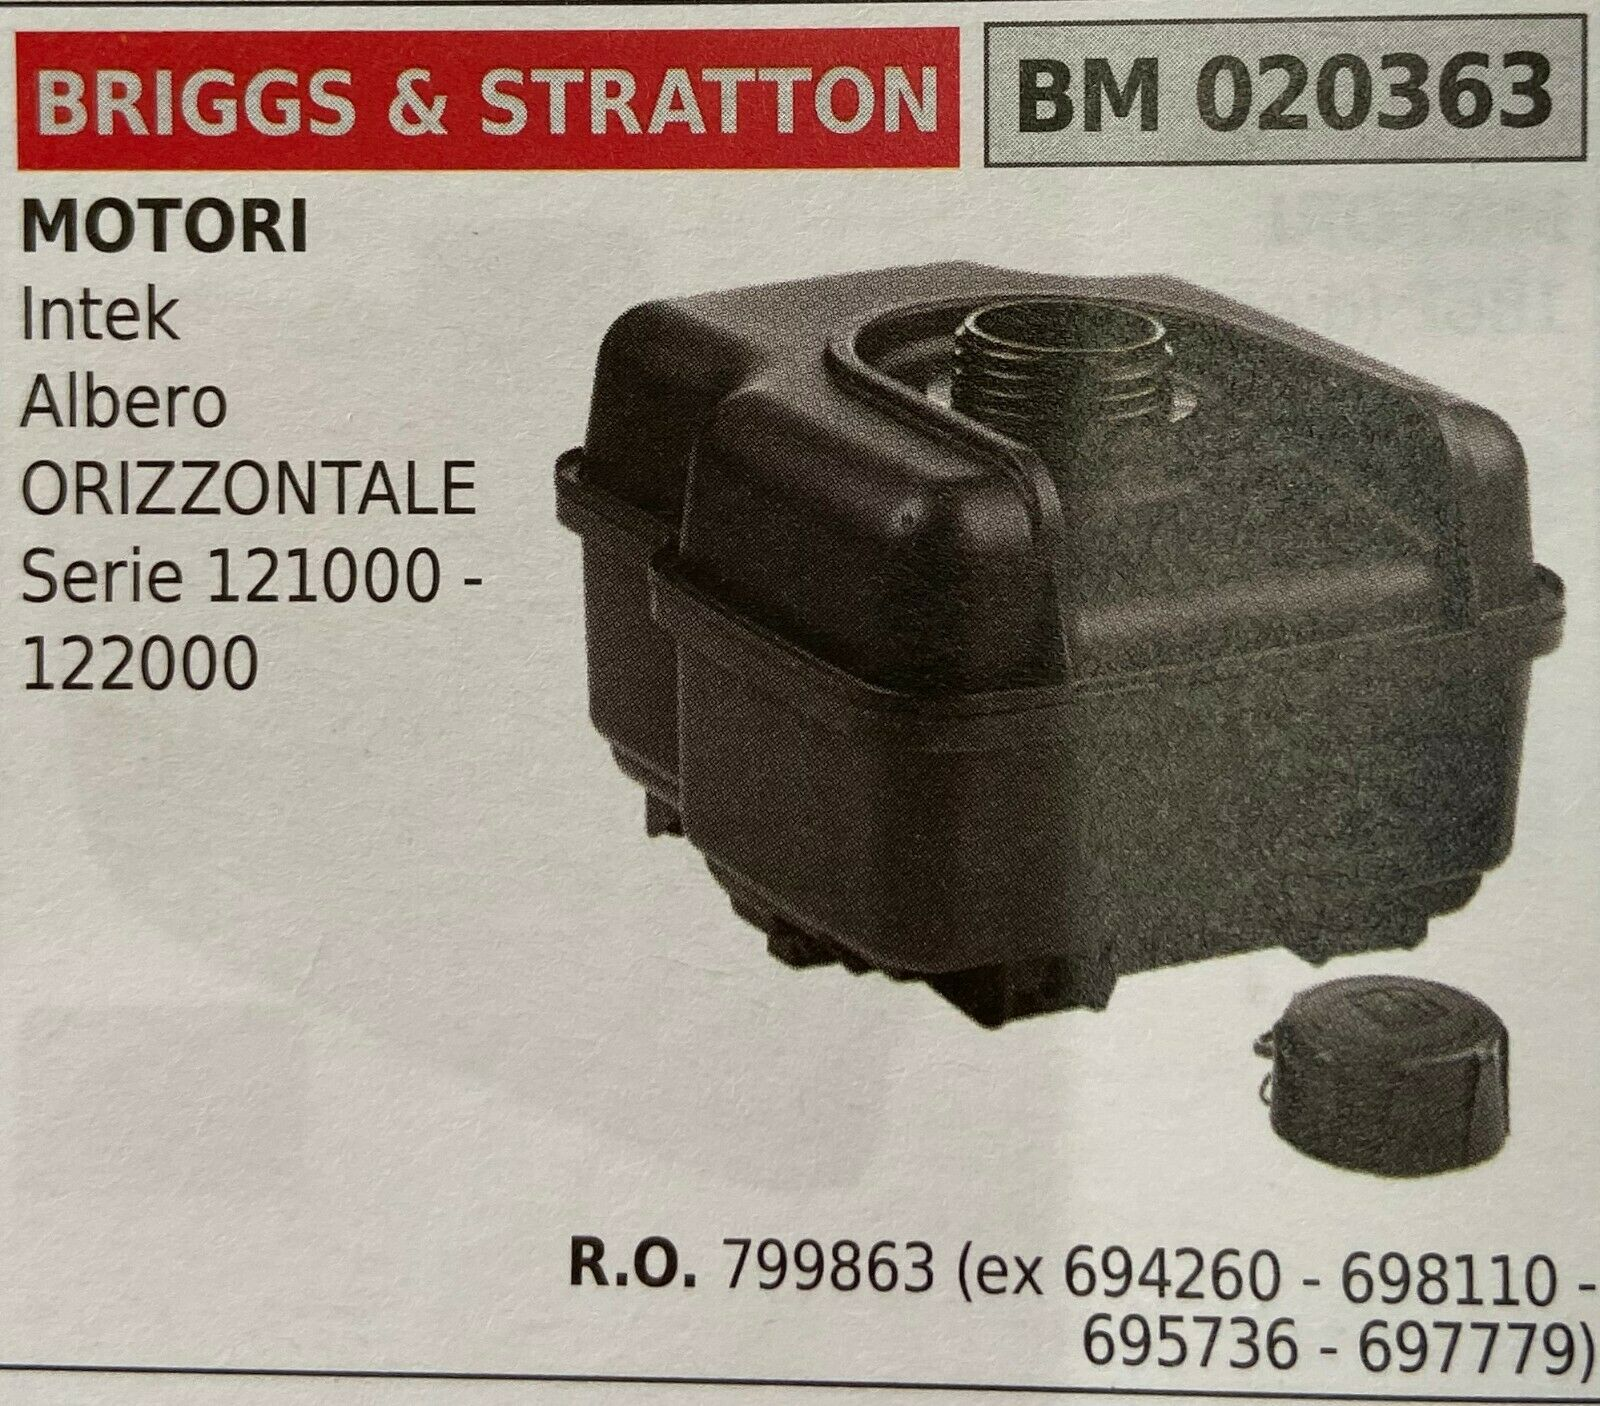 Brumar Tank Briggs & Stratton BM020363